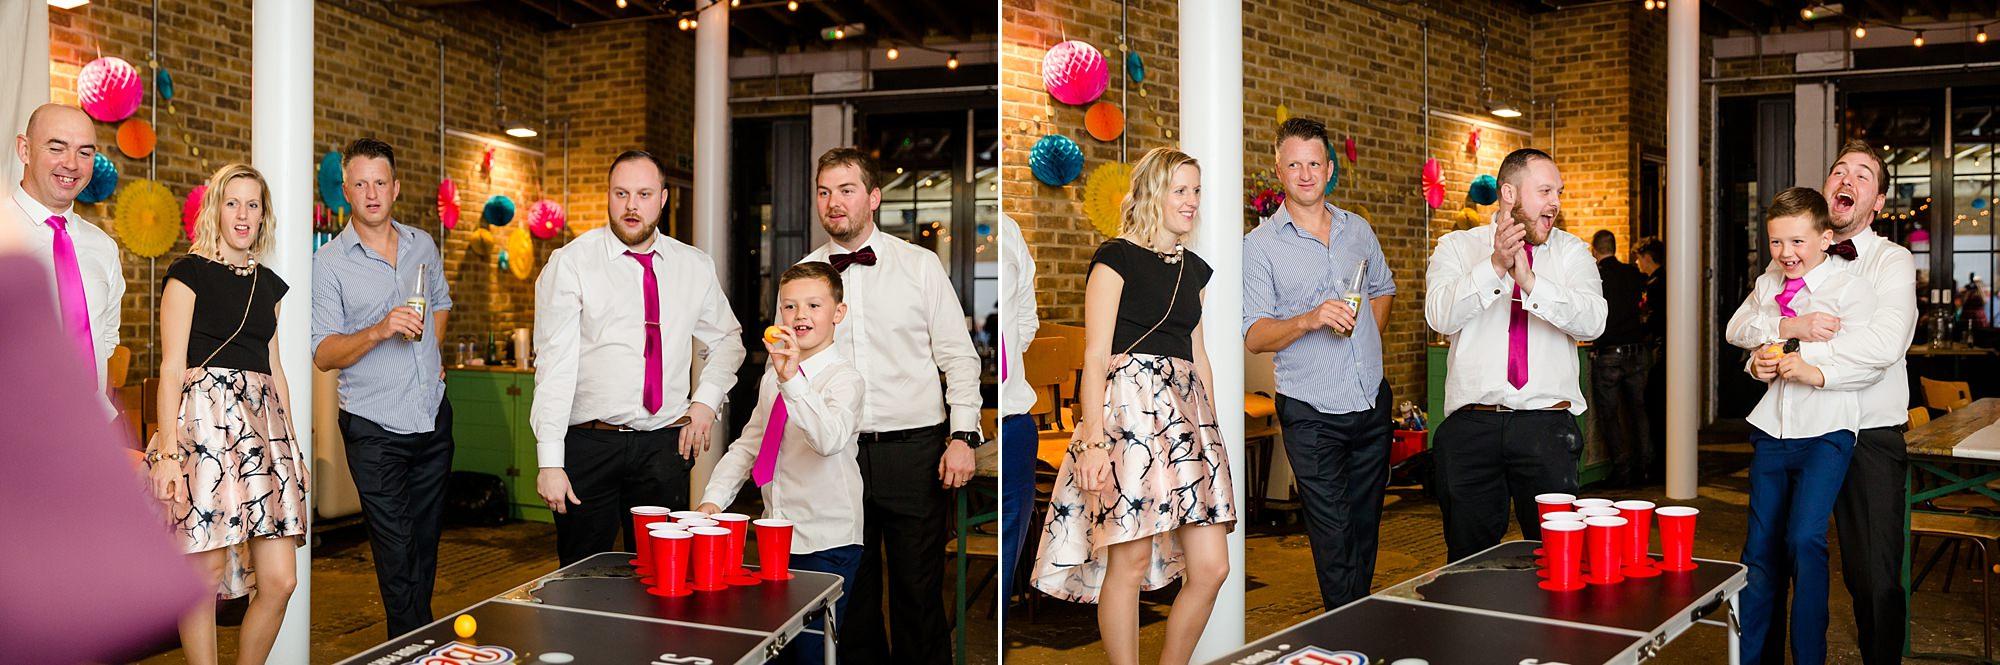 Fun London Wedding guests play beer pong with groom